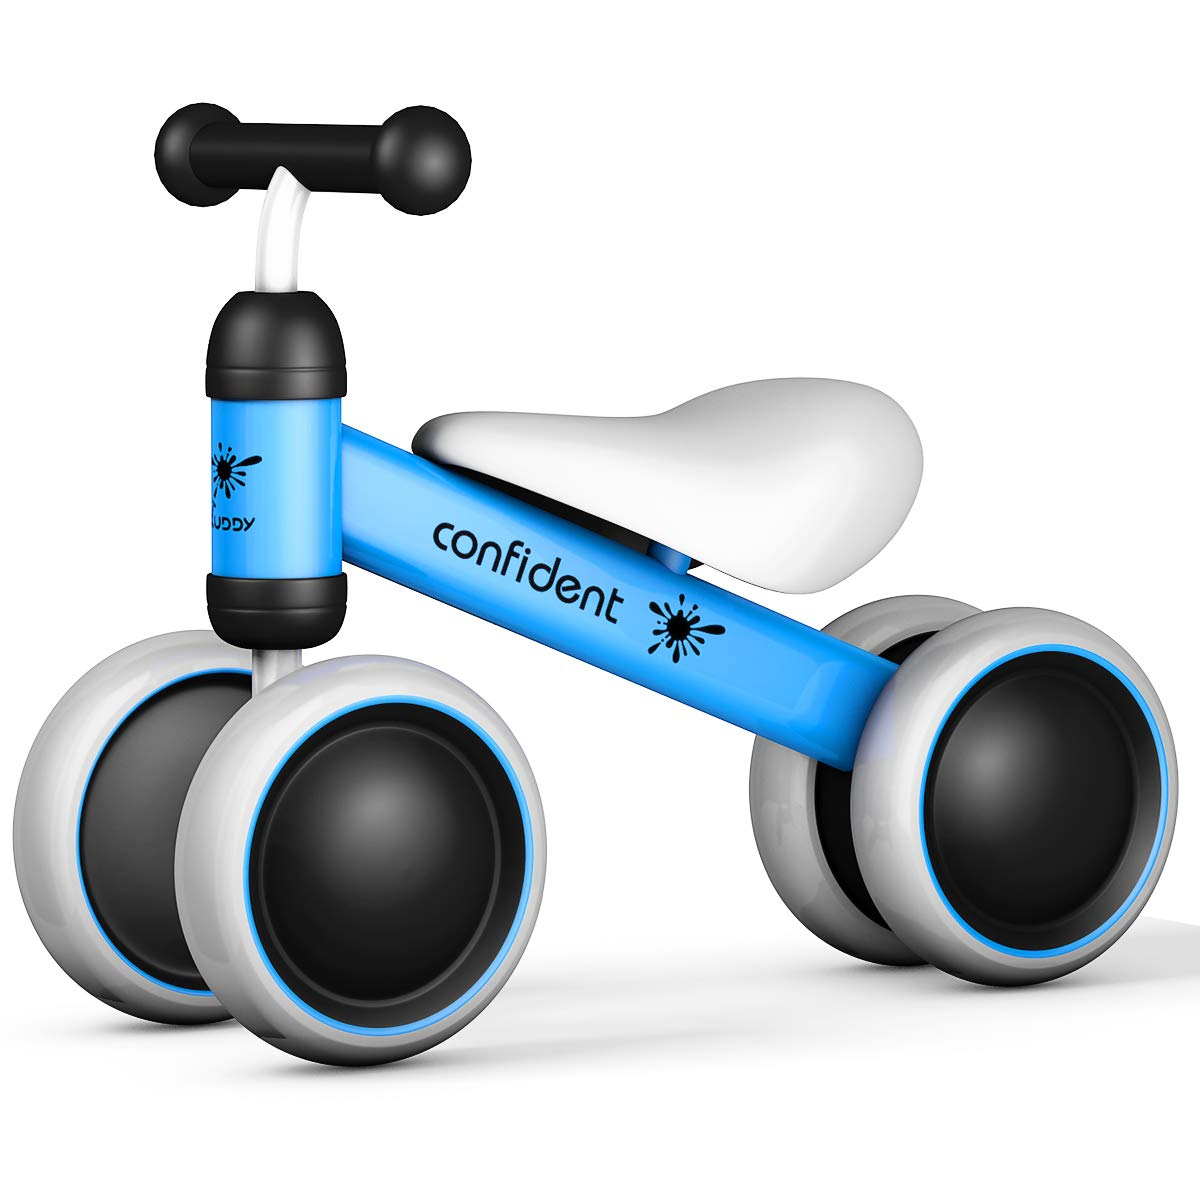 Costzon Baby Balance Bikes, Mini Bike Bicycle, Children Walker Toys Rides for 18-36 Months No Pedal Infant 4 Wheels Toddler Bike (Blue)